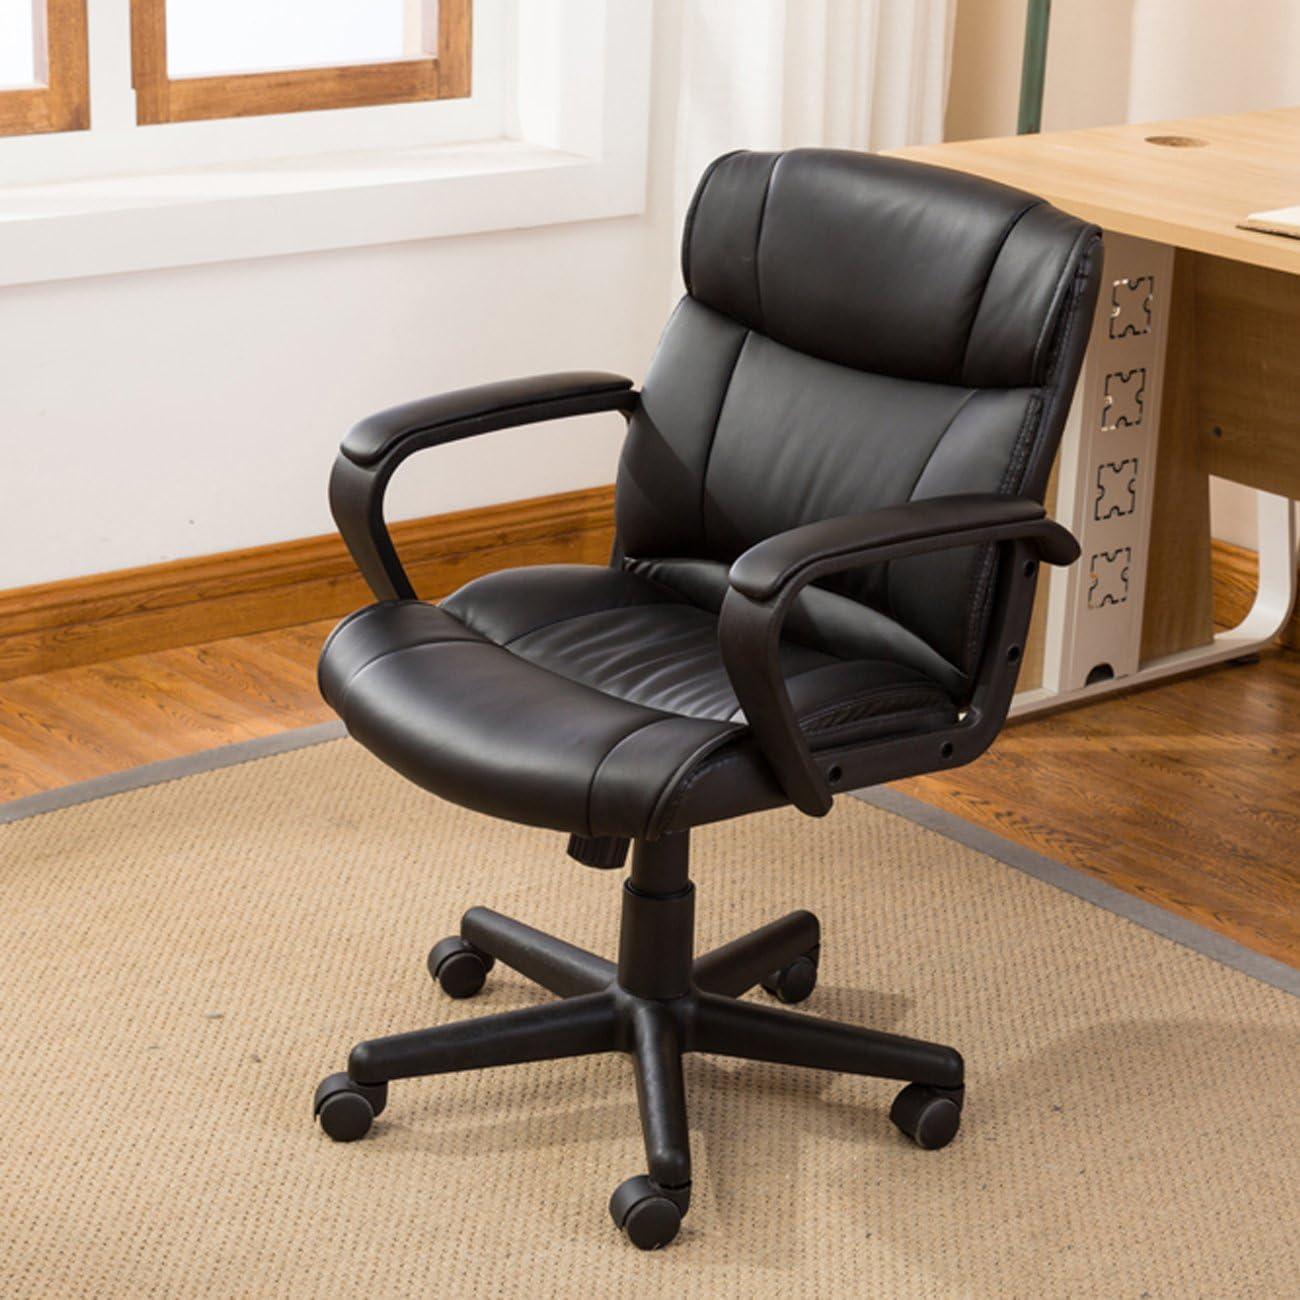 BELLEZE Mid-Back Office Chair Desk Adjustable Ergonomic Computer w Padded Armrest Swivel, Black